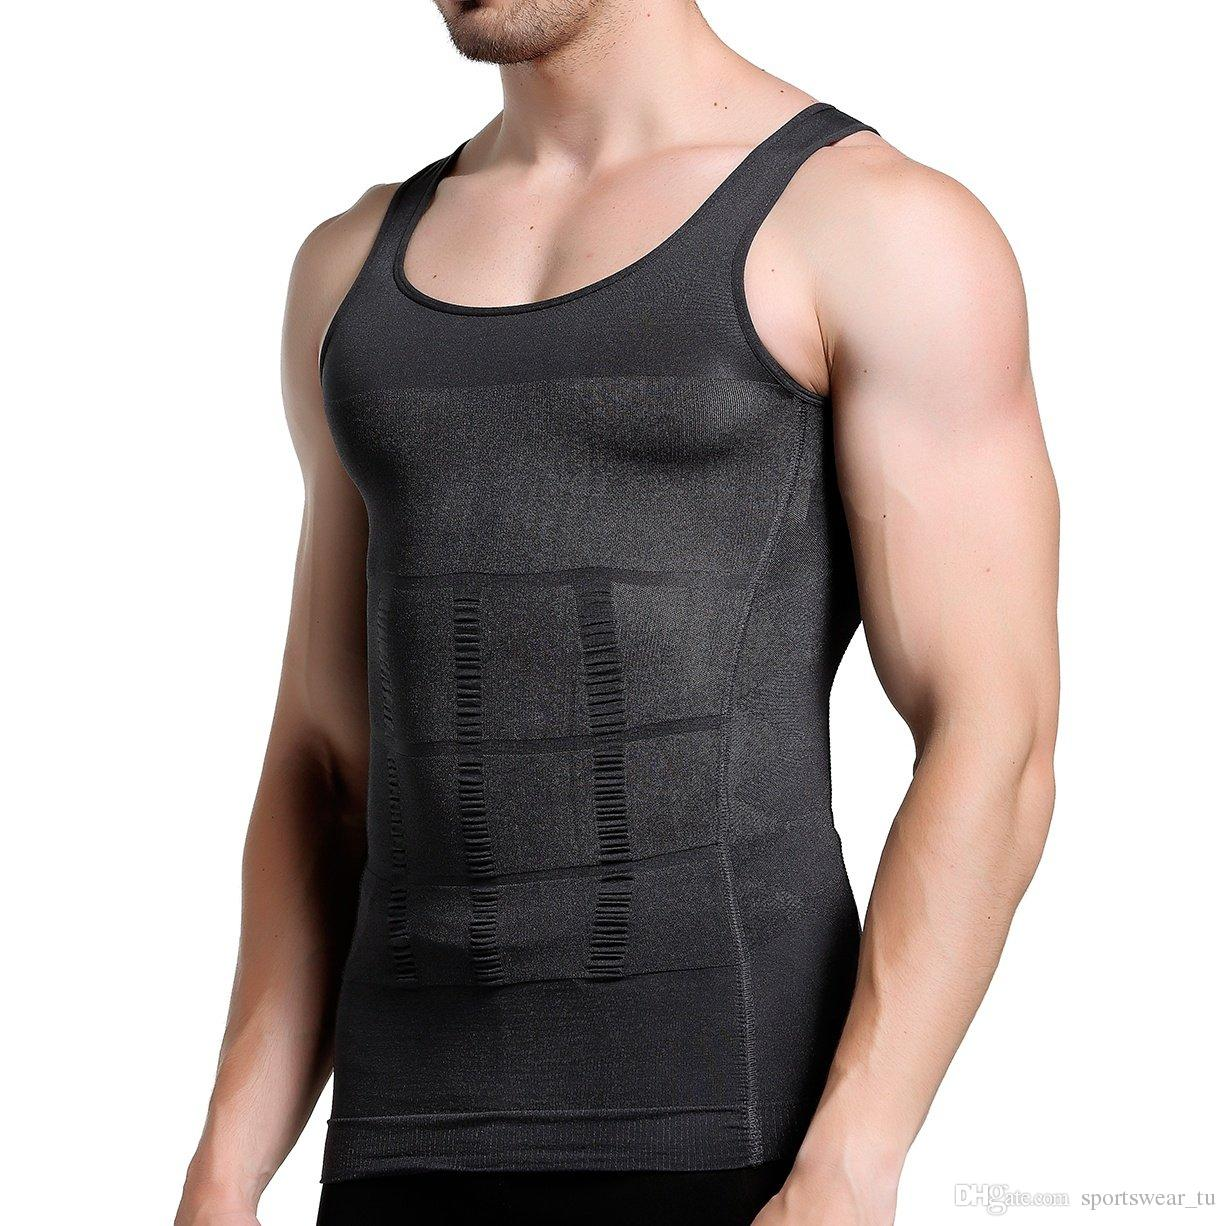 f4543320e6316 Apparel Original Men S Chest Compression Shirt To Hide Gynecomastia Moobs  Shaper Vest Chest Compression Shirt Abdomen Slim Tank Top Cool T Shirts T  Shirts ...